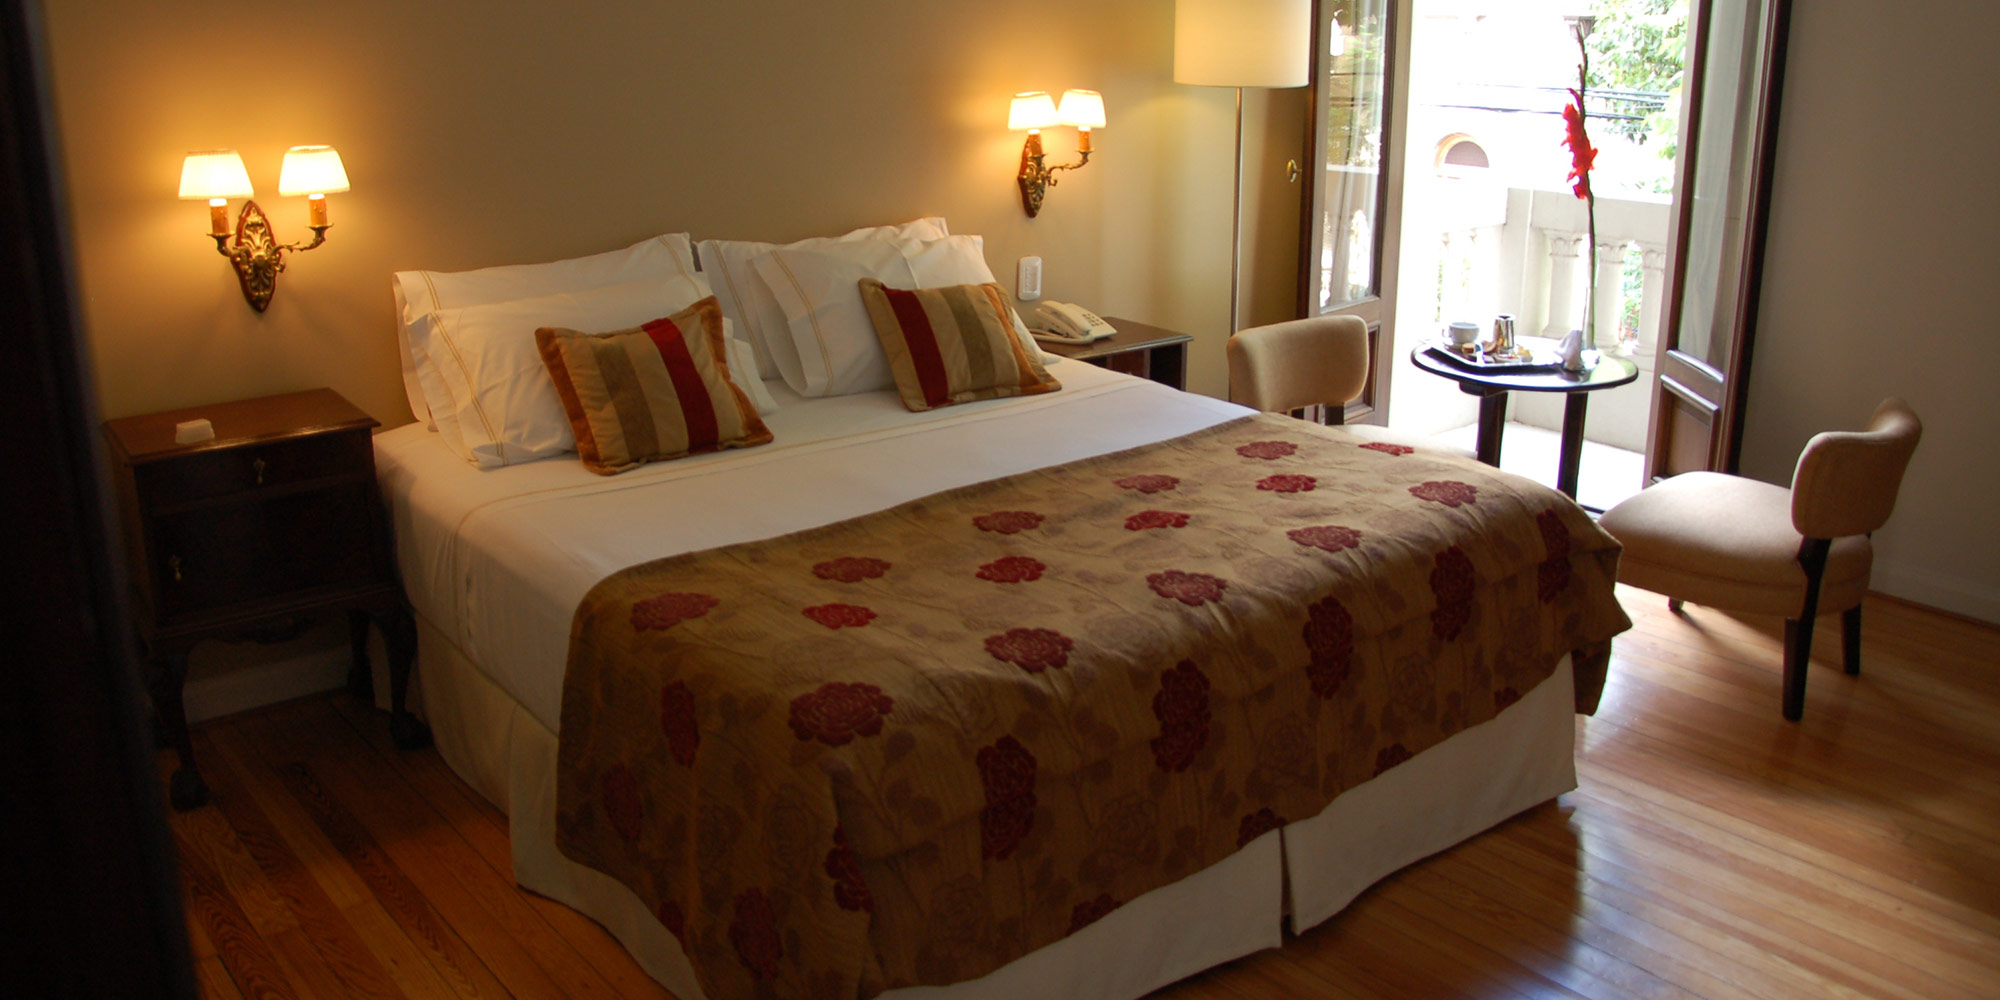 Magnolia-Hotel-Boutique-Palermo-Buenos-Aires-design-by-Guapo-56